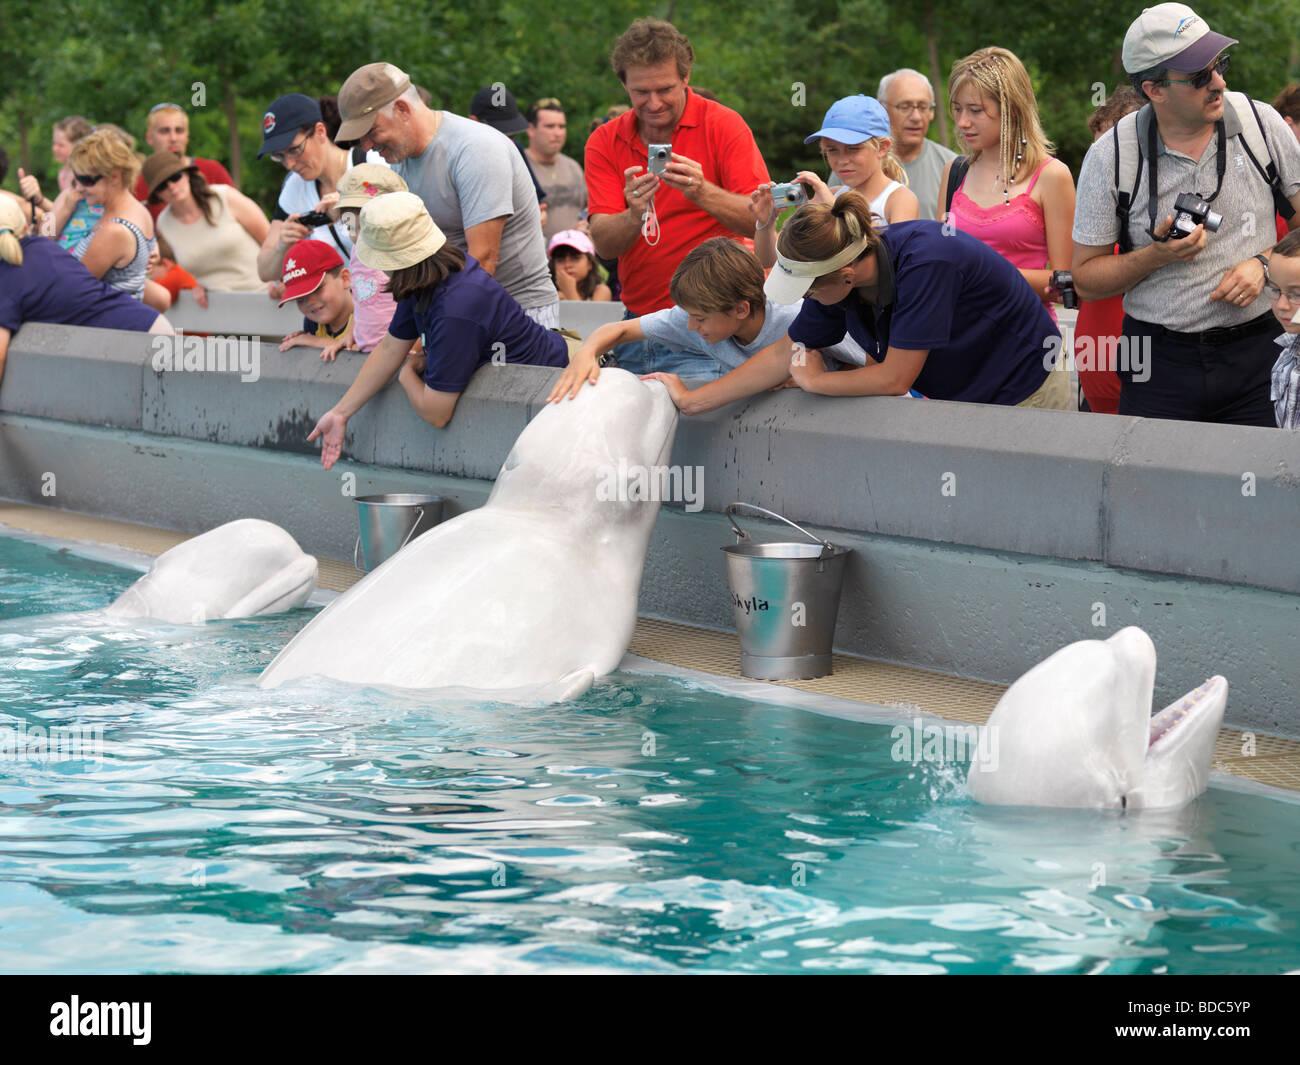 People feeding beluga whales at Marineland Niagara Falls Canada - Stock Image